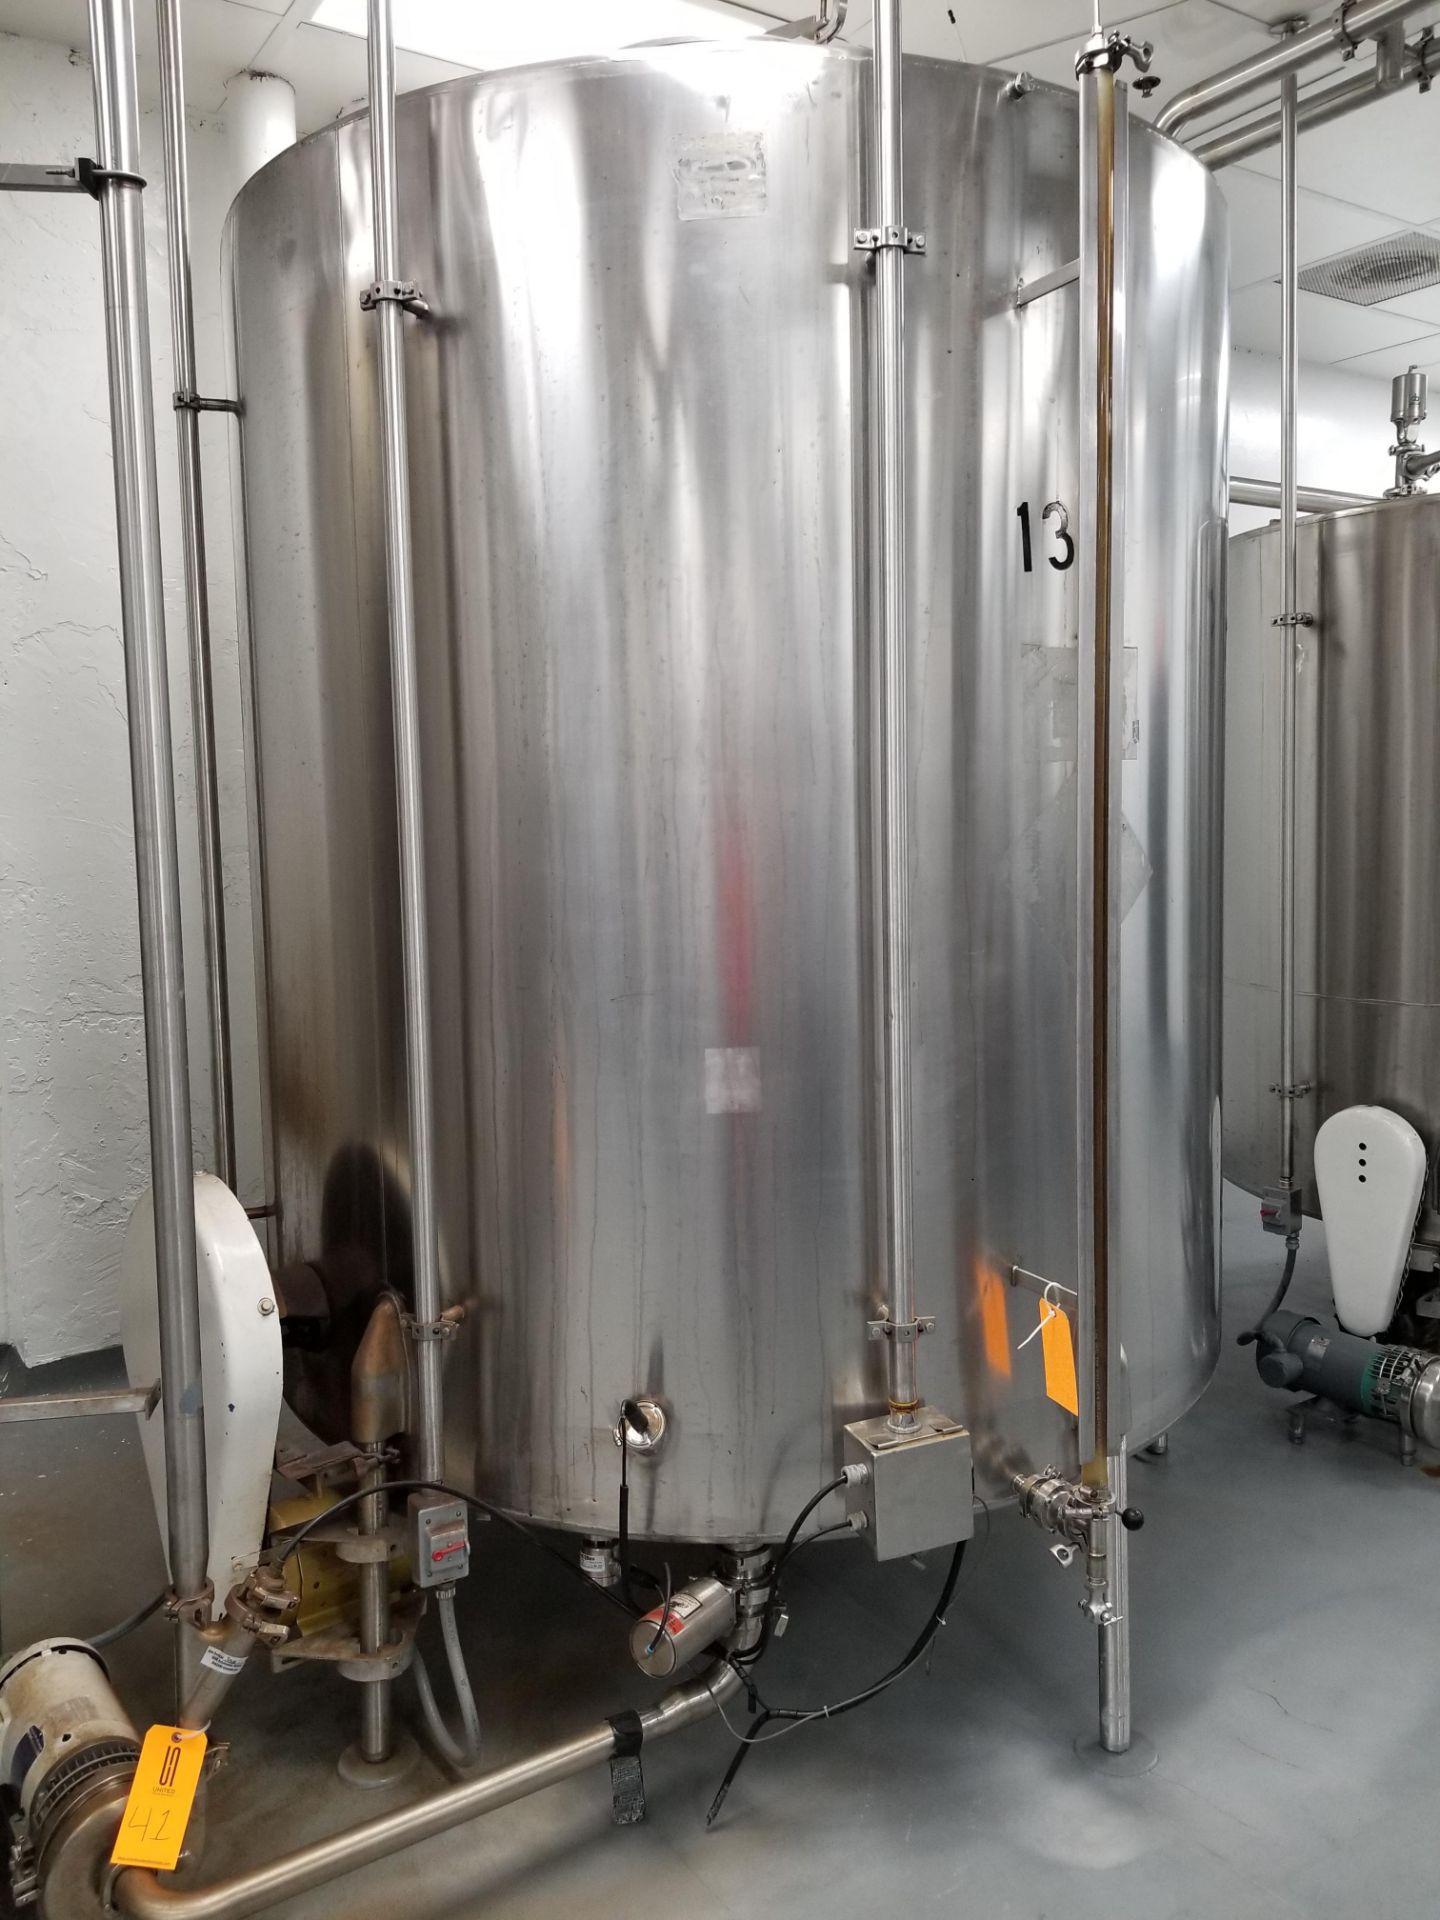 Chem Tank 2,000 Gallon Vertical Mixing Tank - Image 2 of 7